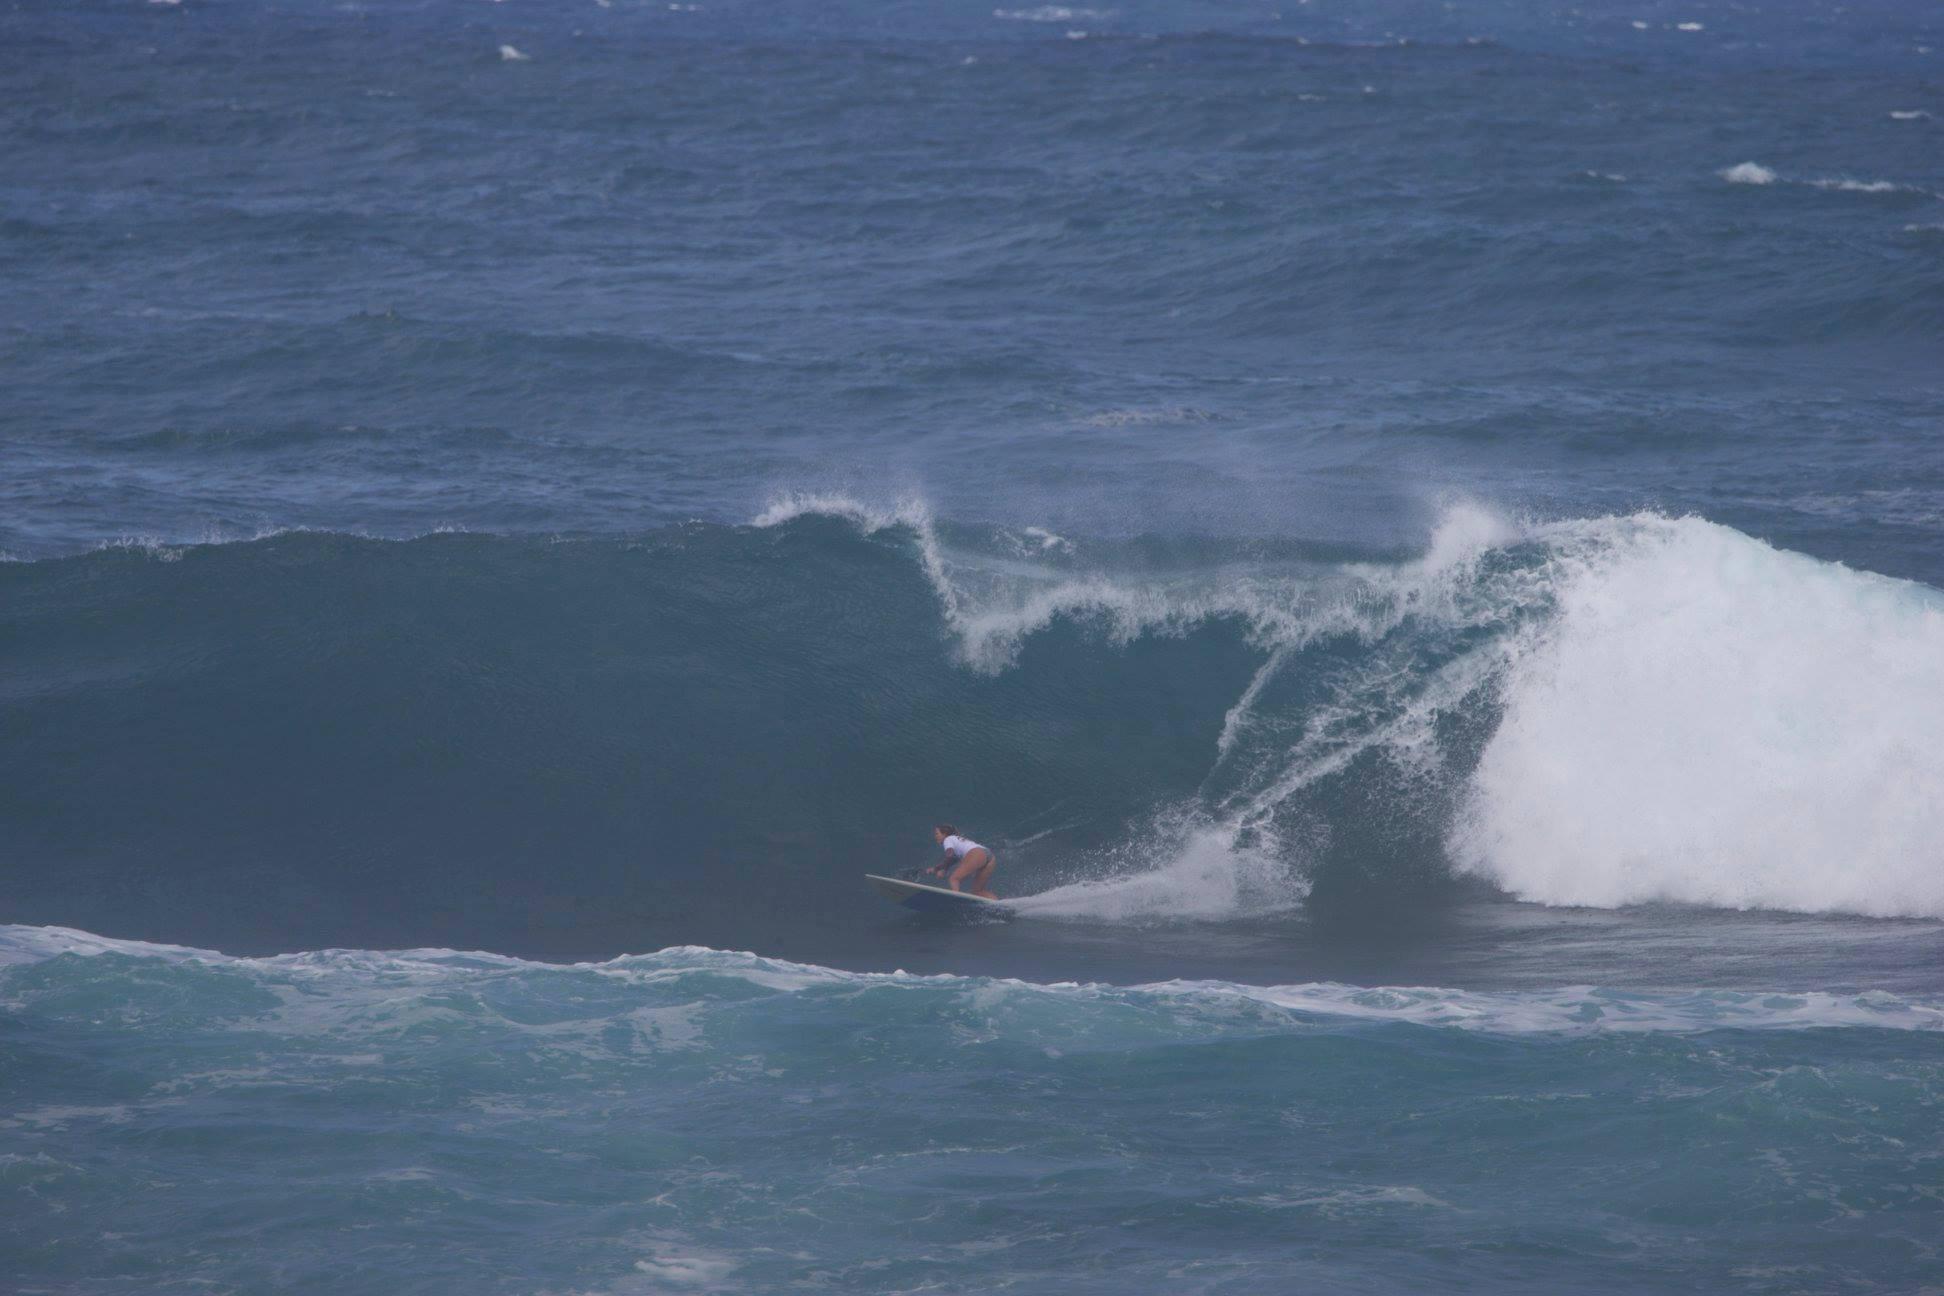 Fiona-Wylde-Wins-APPs-2019-Sunset-Beach-Pro-bottom-turn